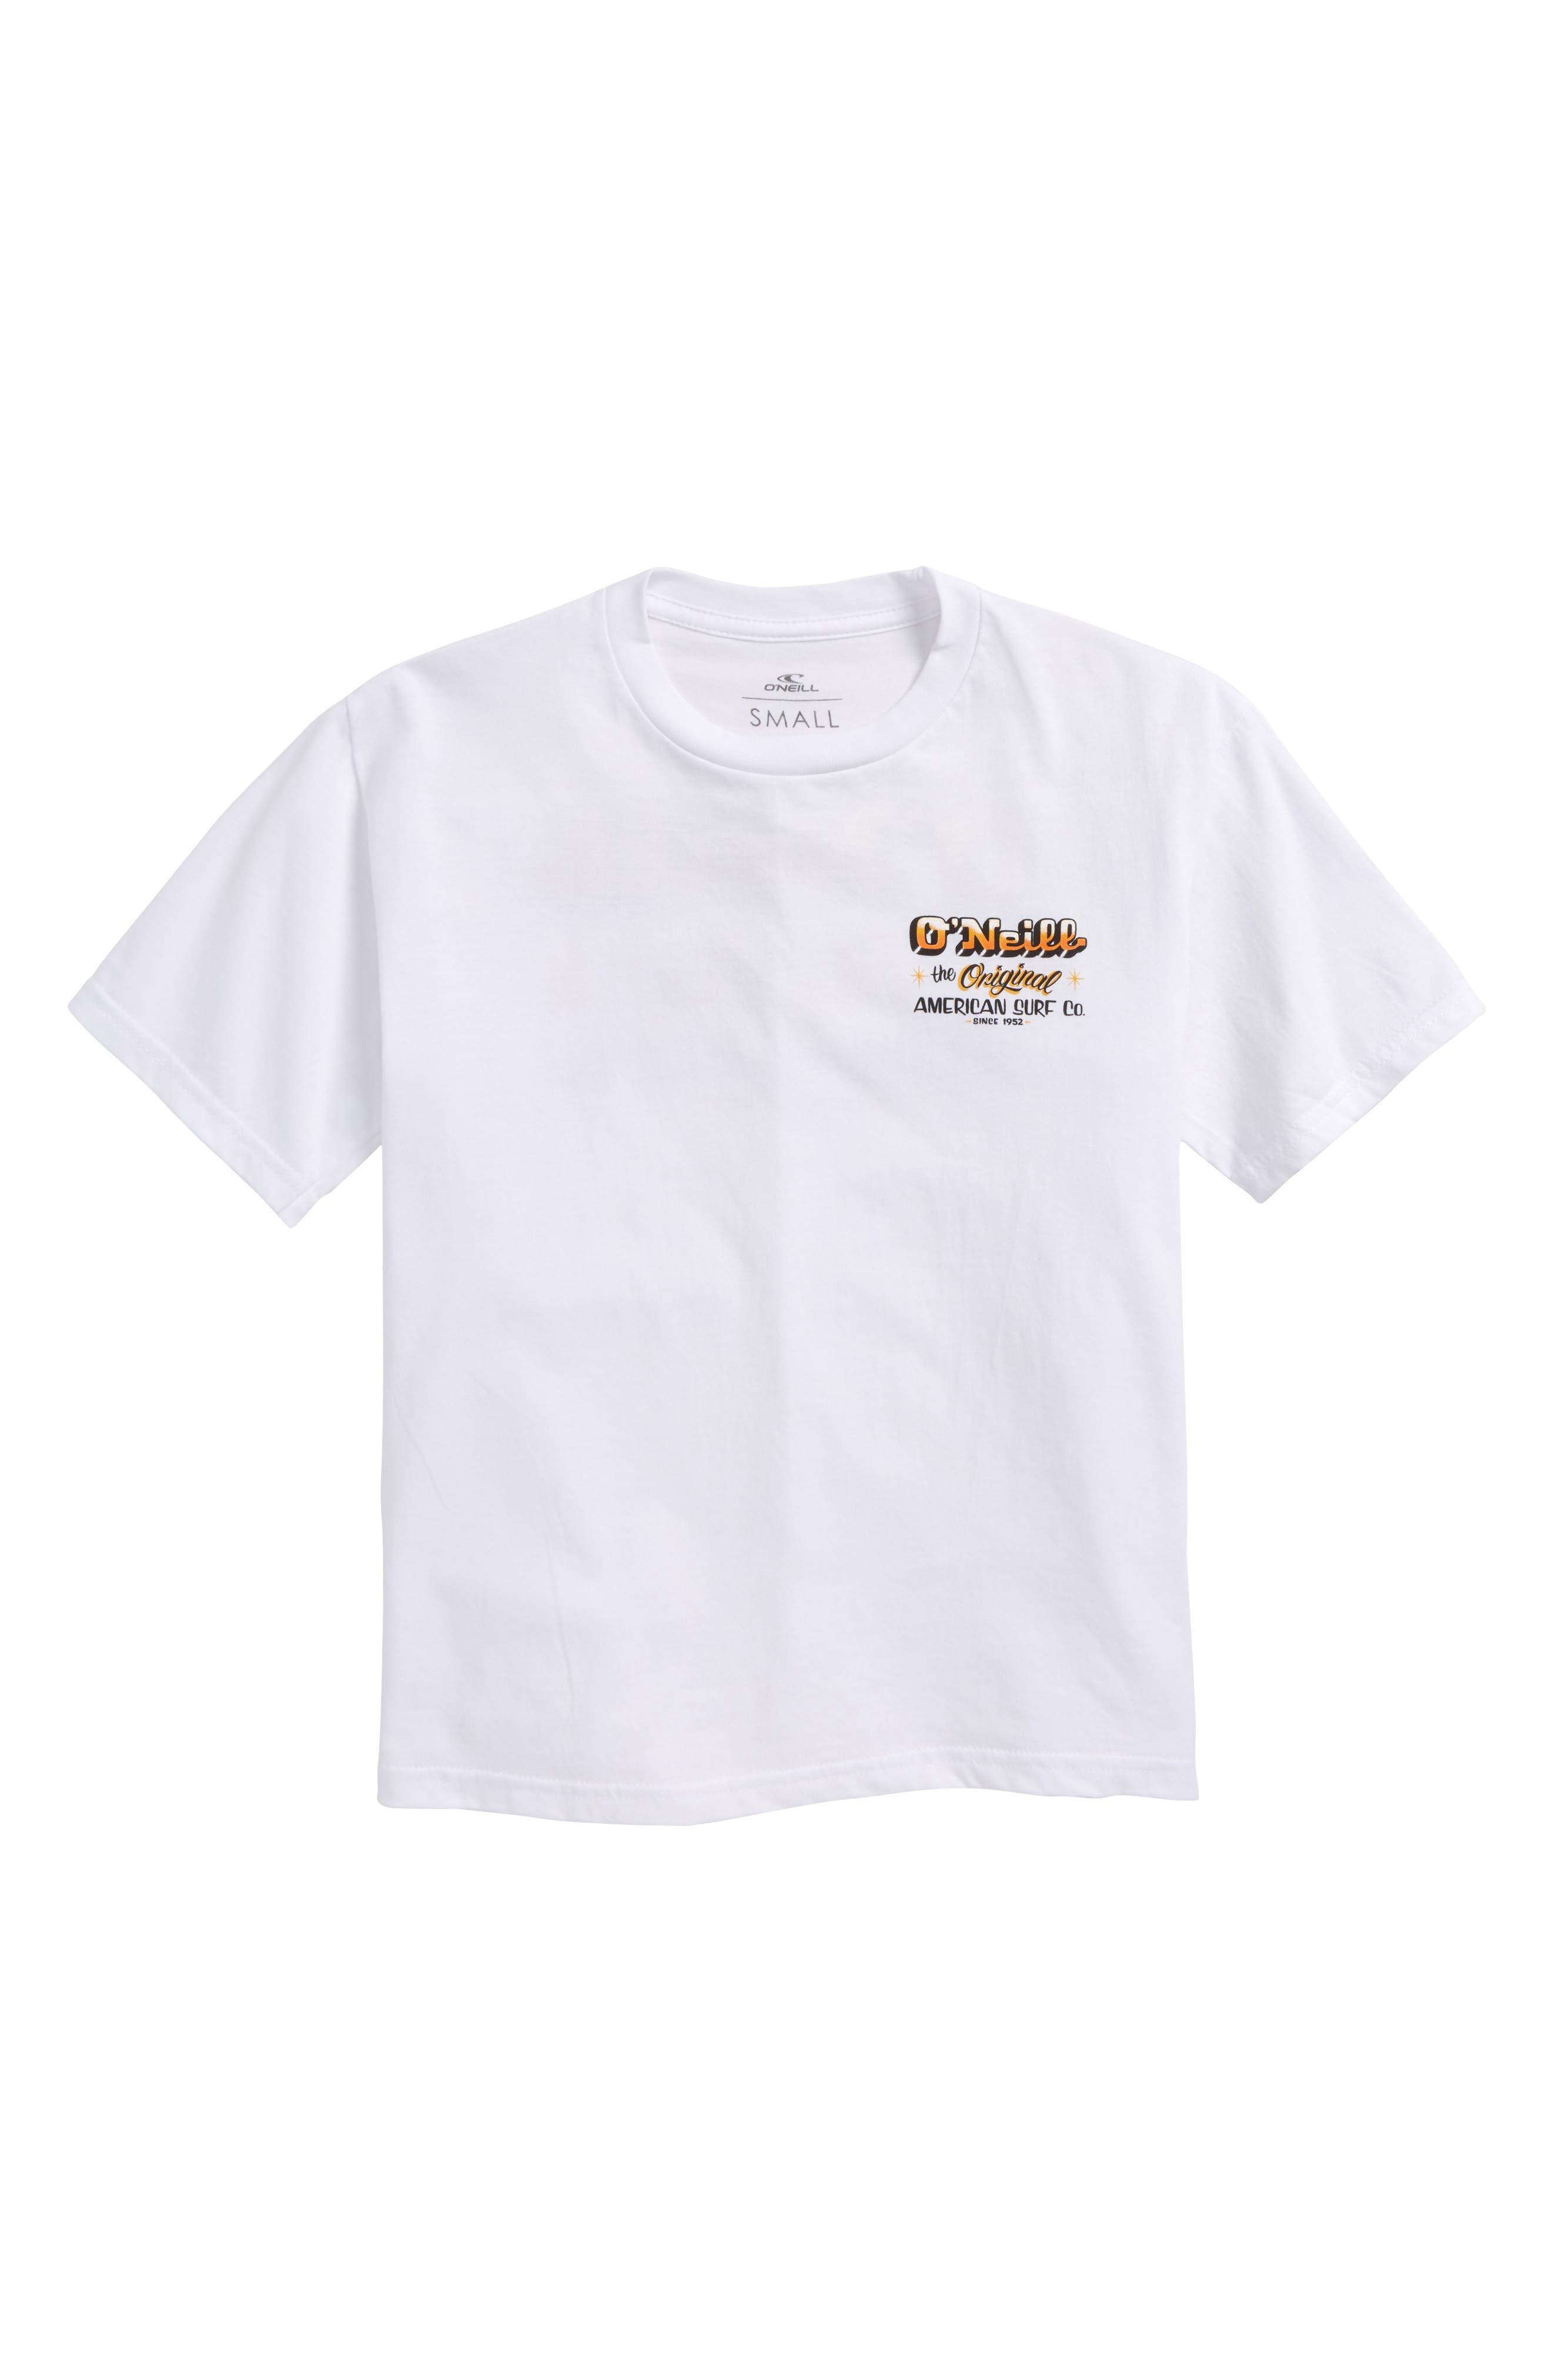 O'Neill Tuki Logo T-Shirt (Big Boys)